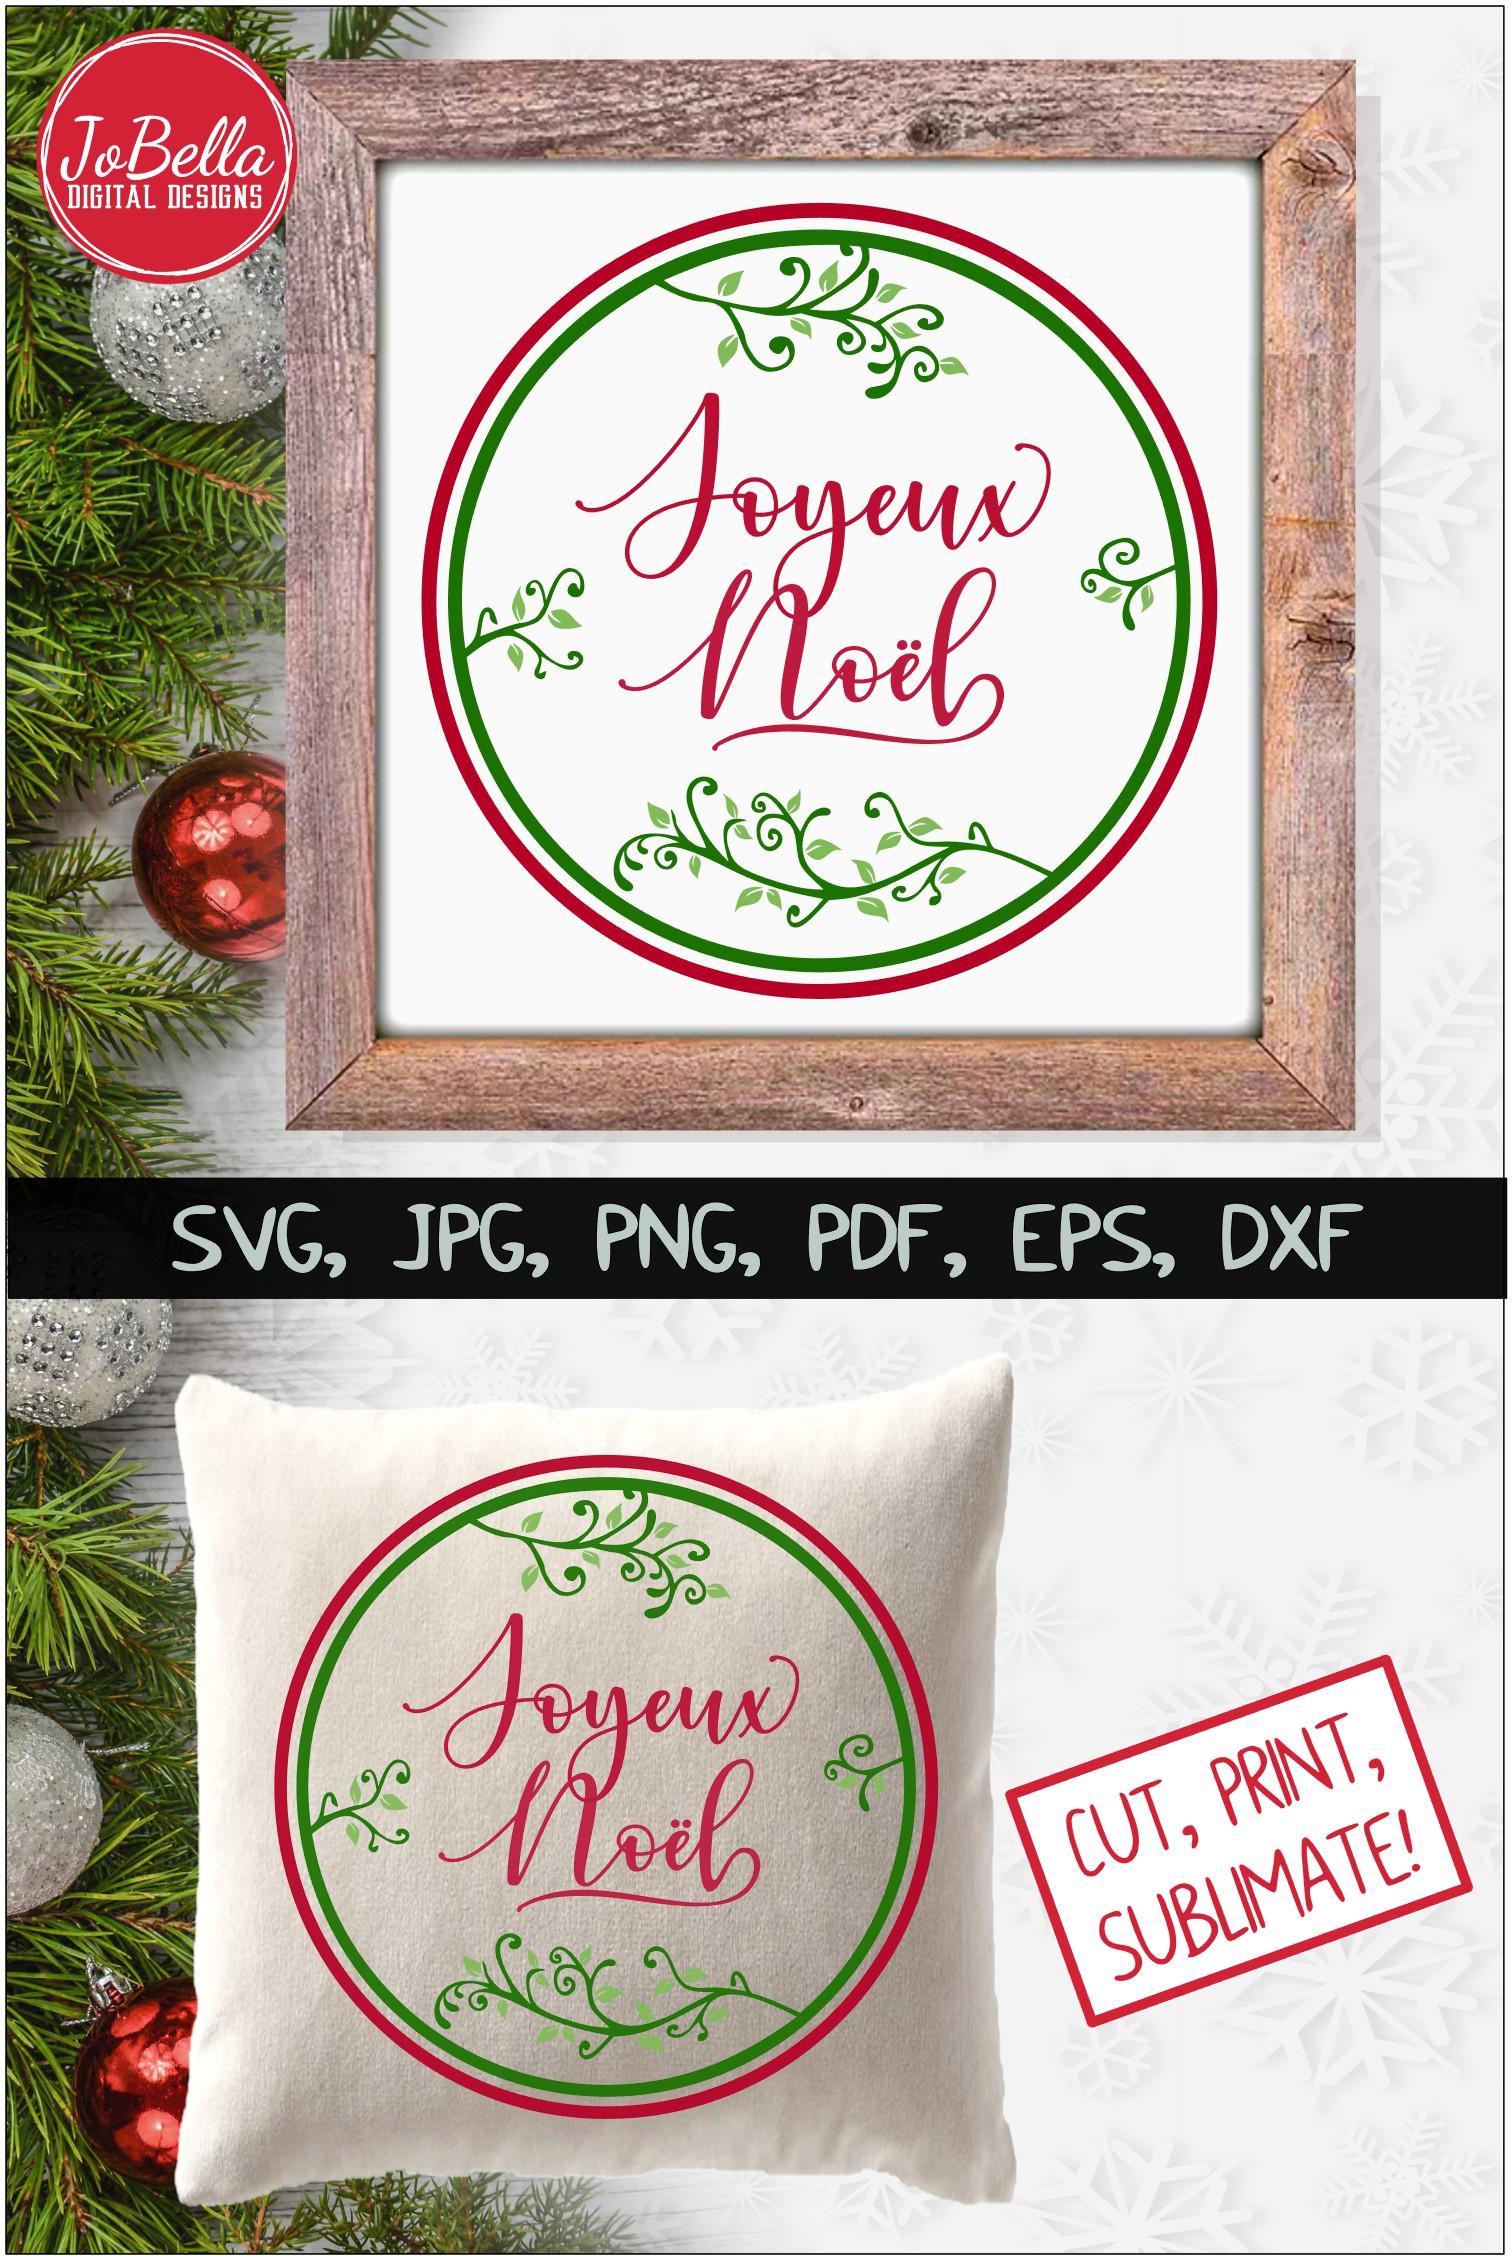 Joyeux Noel SVG Printable & Sublimation PNG example image 4